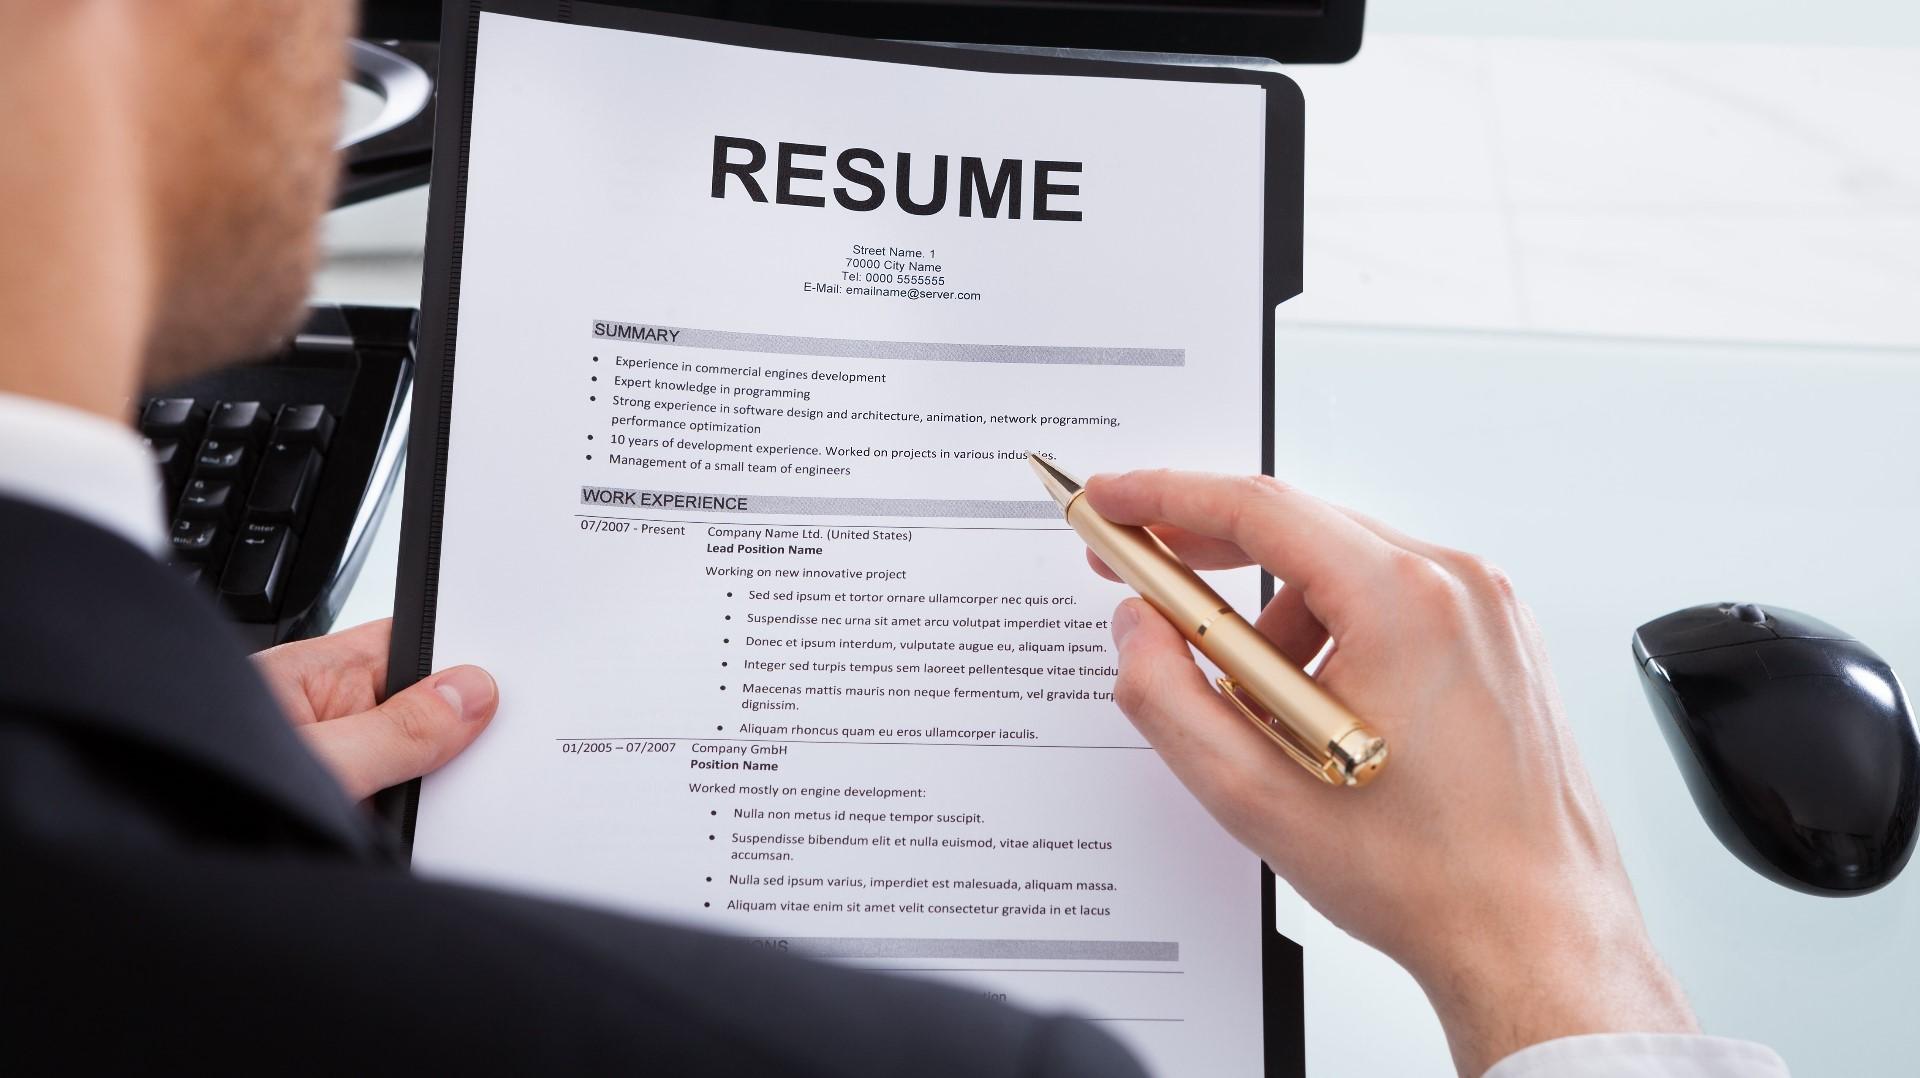 5 tips for writing a good resume ksdk com